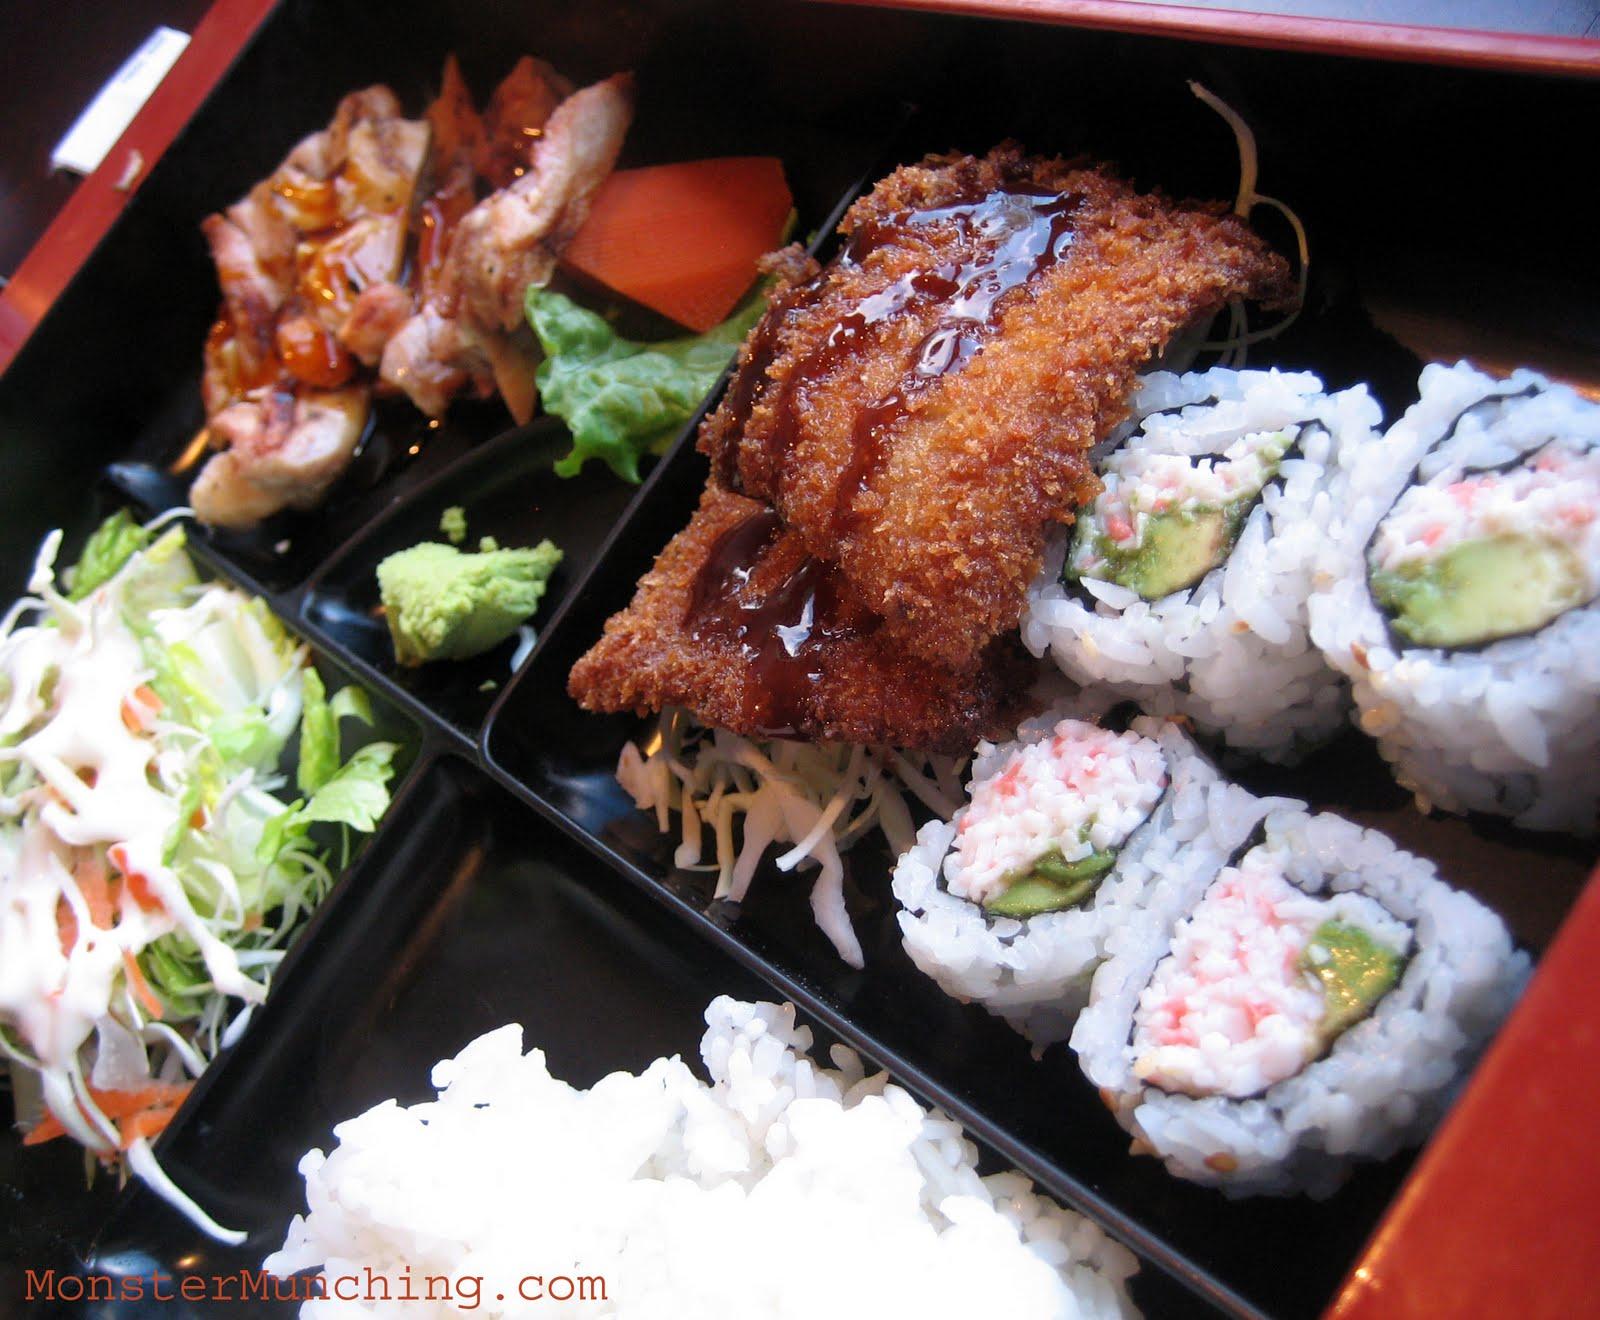 monster munching ichiban sushi downey. Black Bedroom Furniture Sets. Home Design Ideas